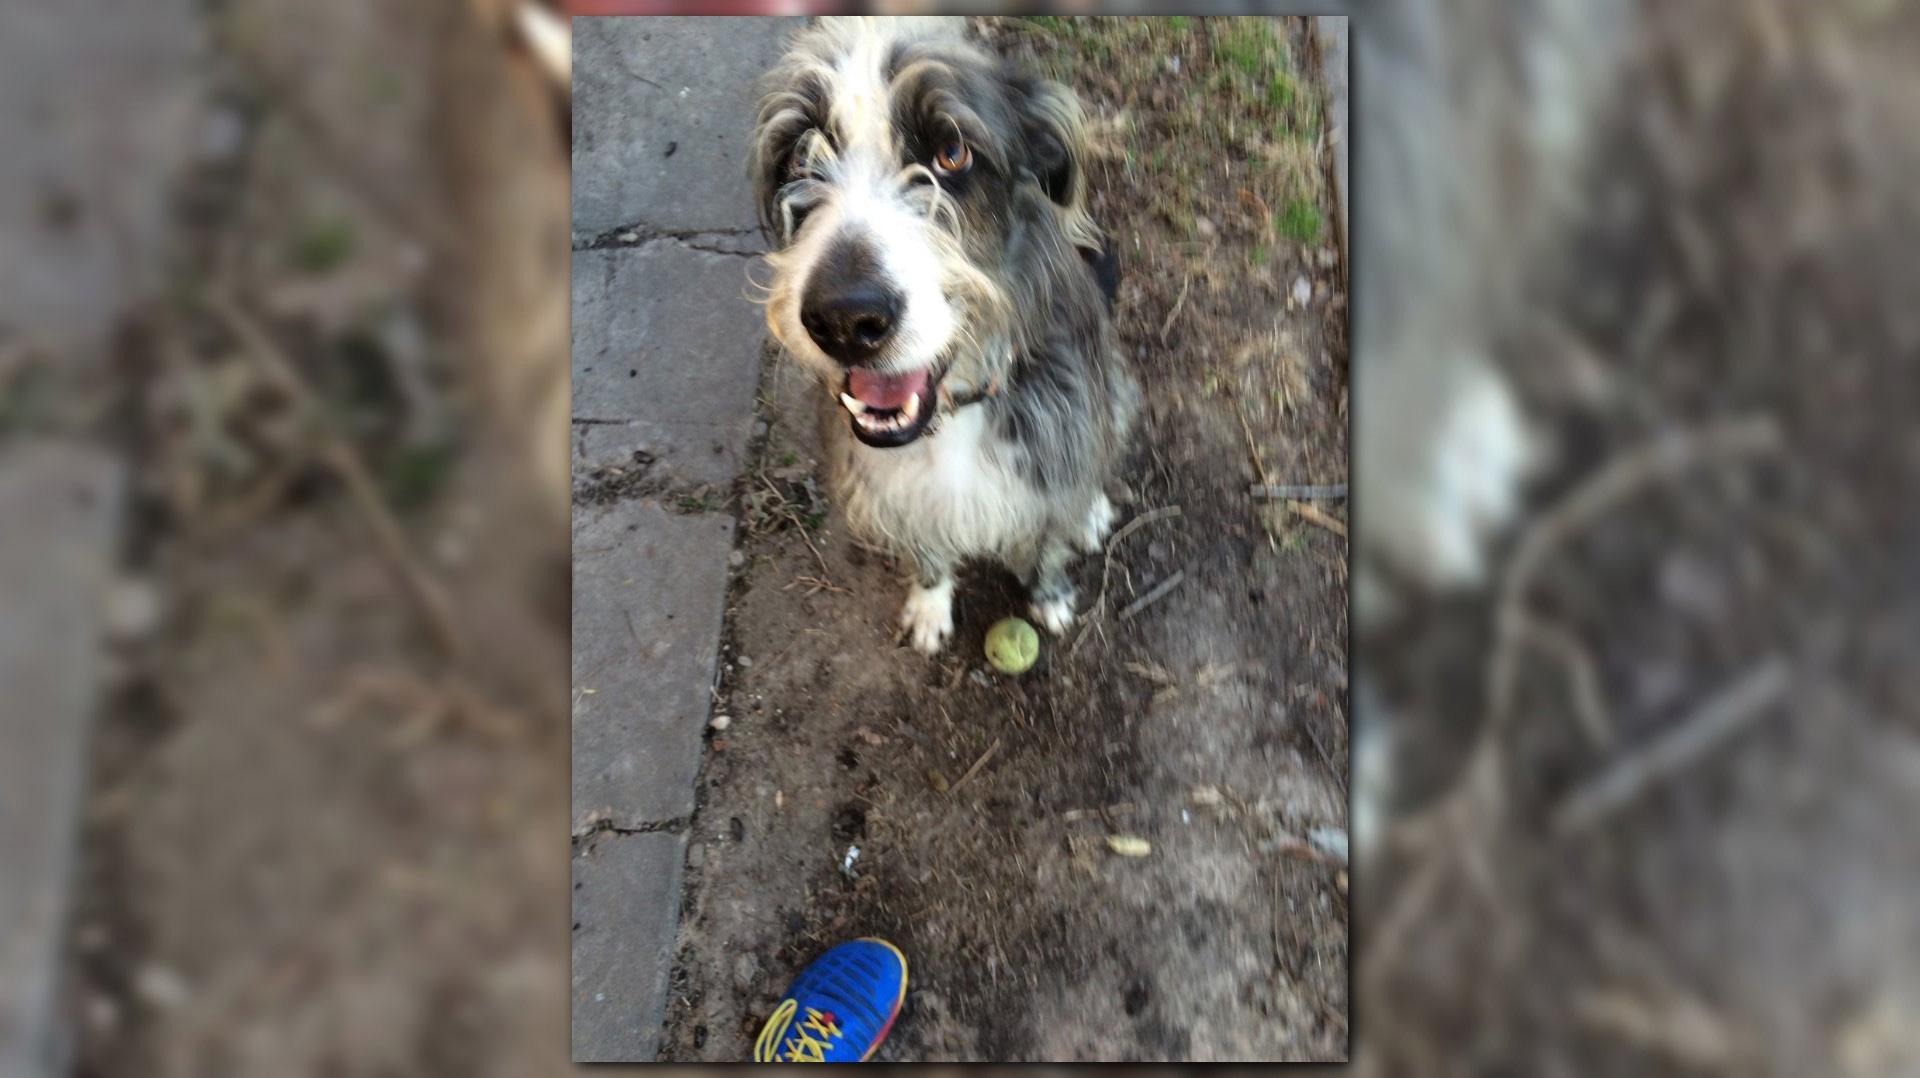 surveillance video catches moment firefighter u0027s dog shot killed